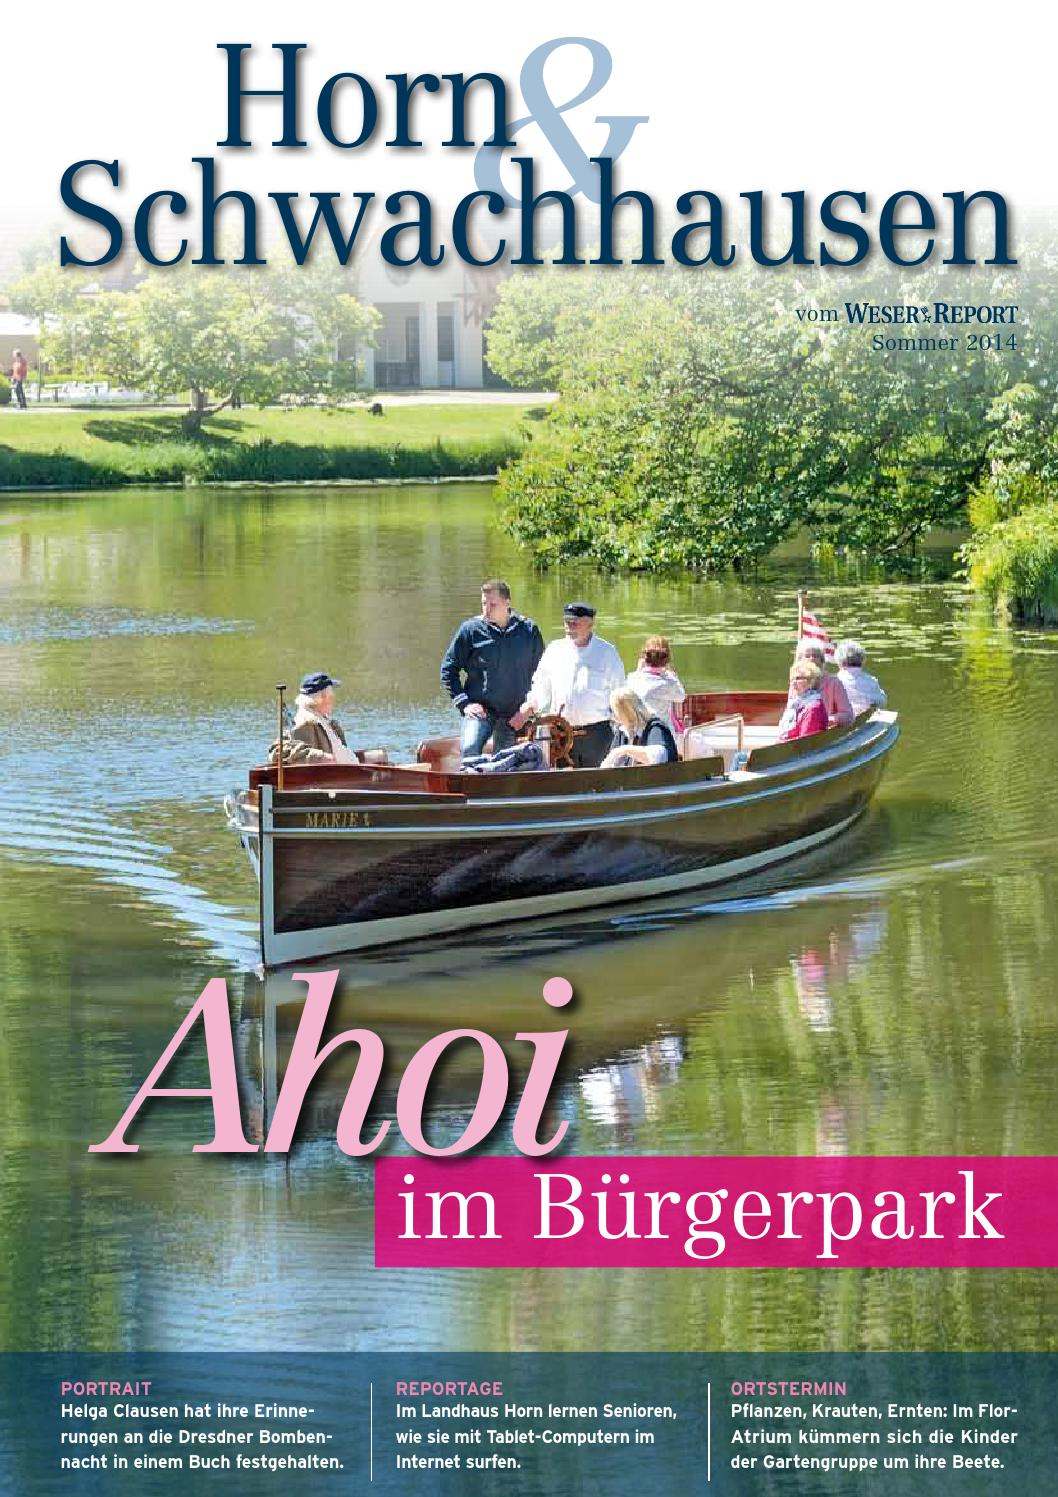 Horn & Schwachhausen_Sommer 2014 by KPS Verlagsgesellschaft mbH - issuu